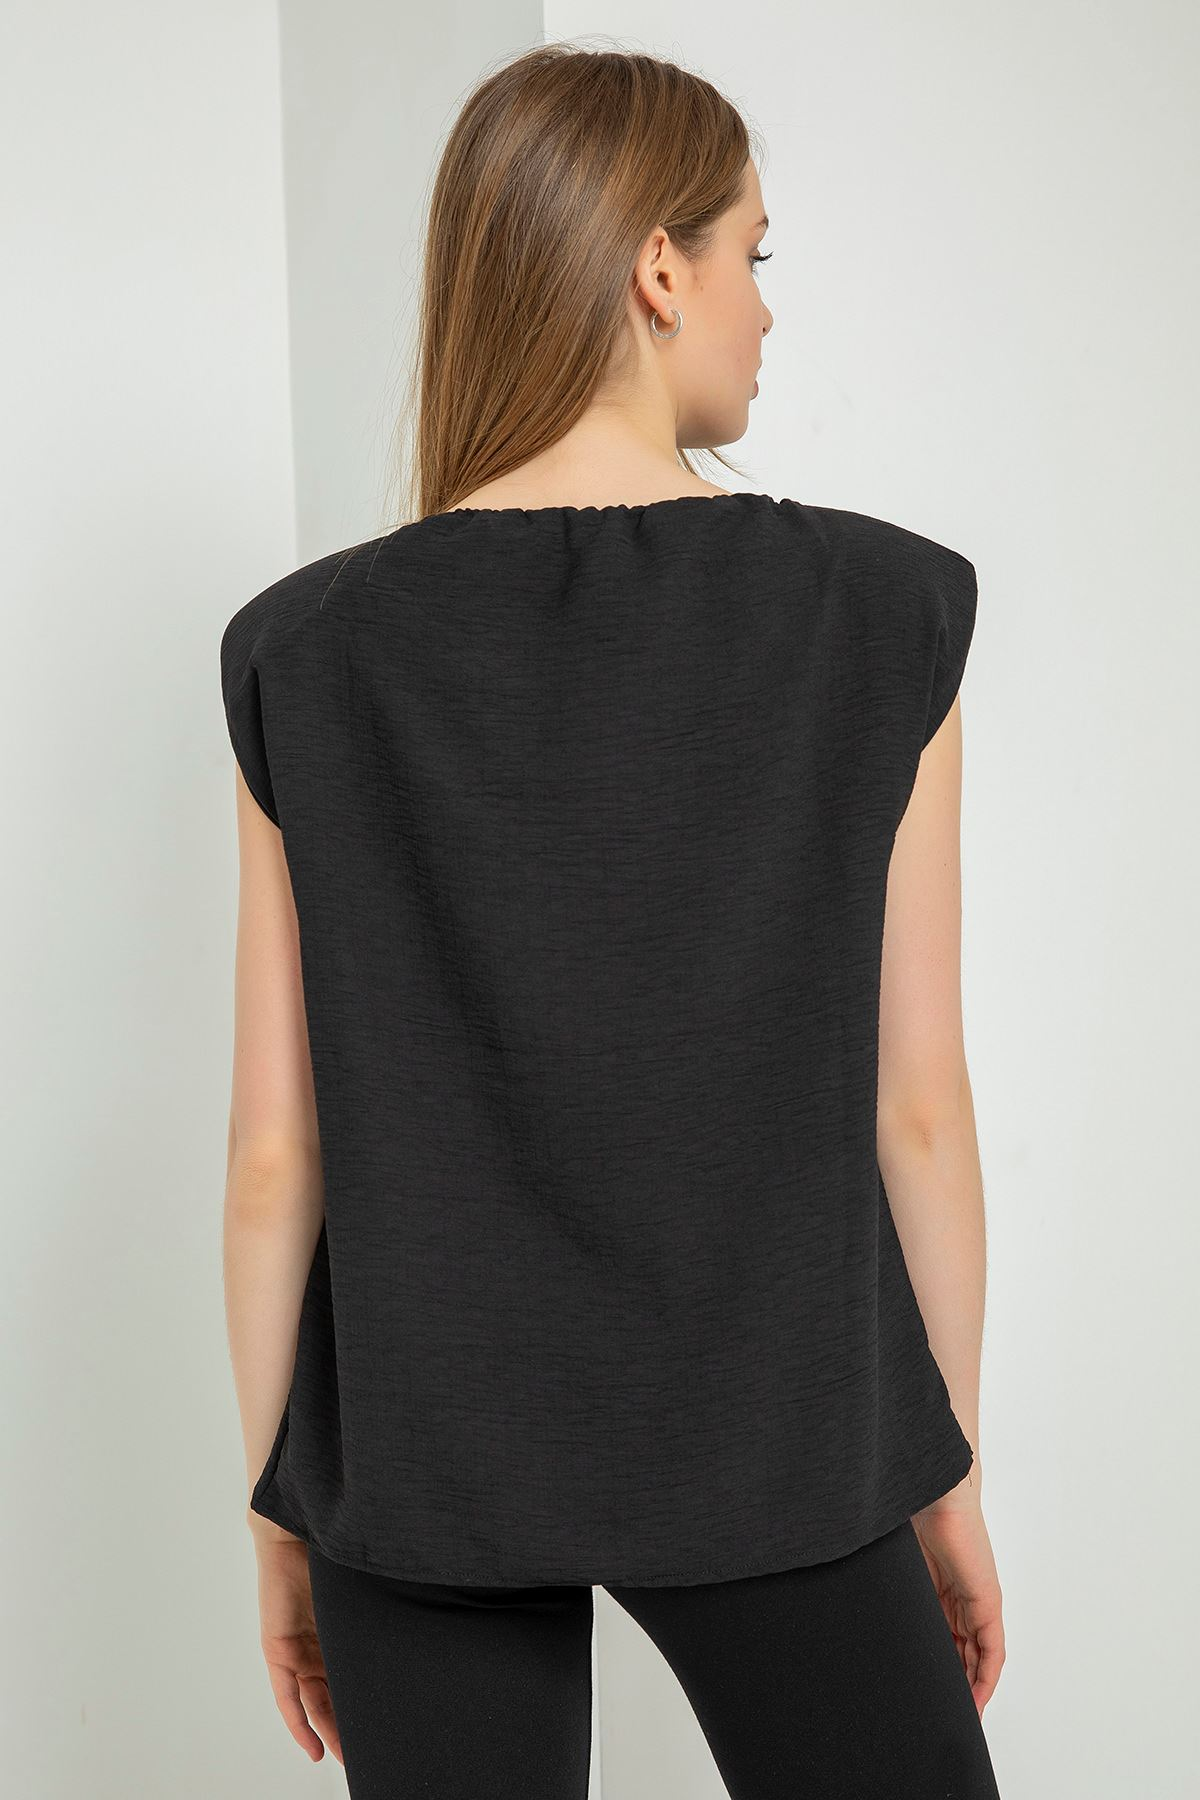 Madonna Yaka Vatkalı Bluz-Siyah